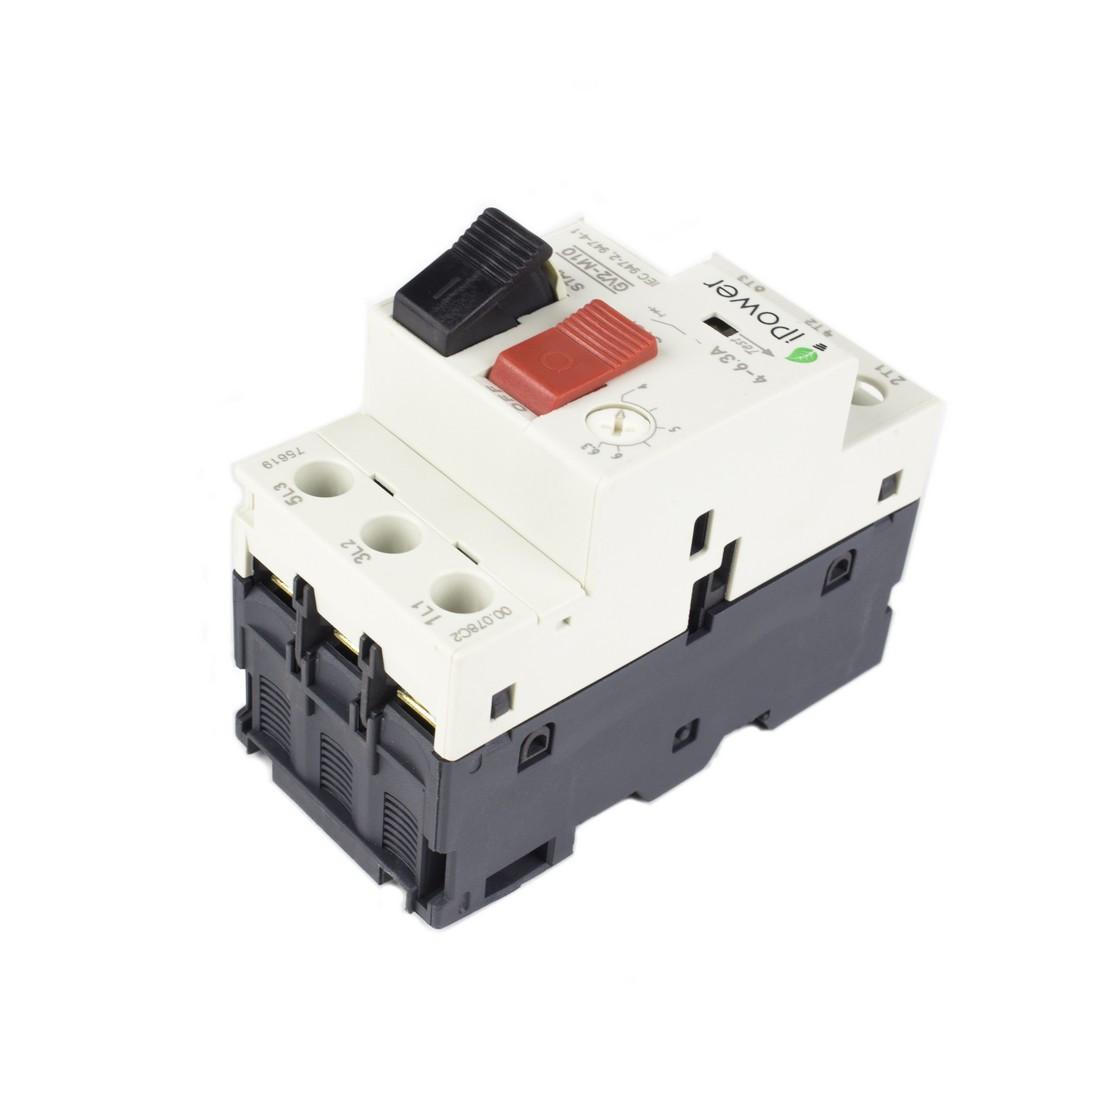 Автомат защиты двигателя iPower GV2-M06 (1-1.6A) - фото 2